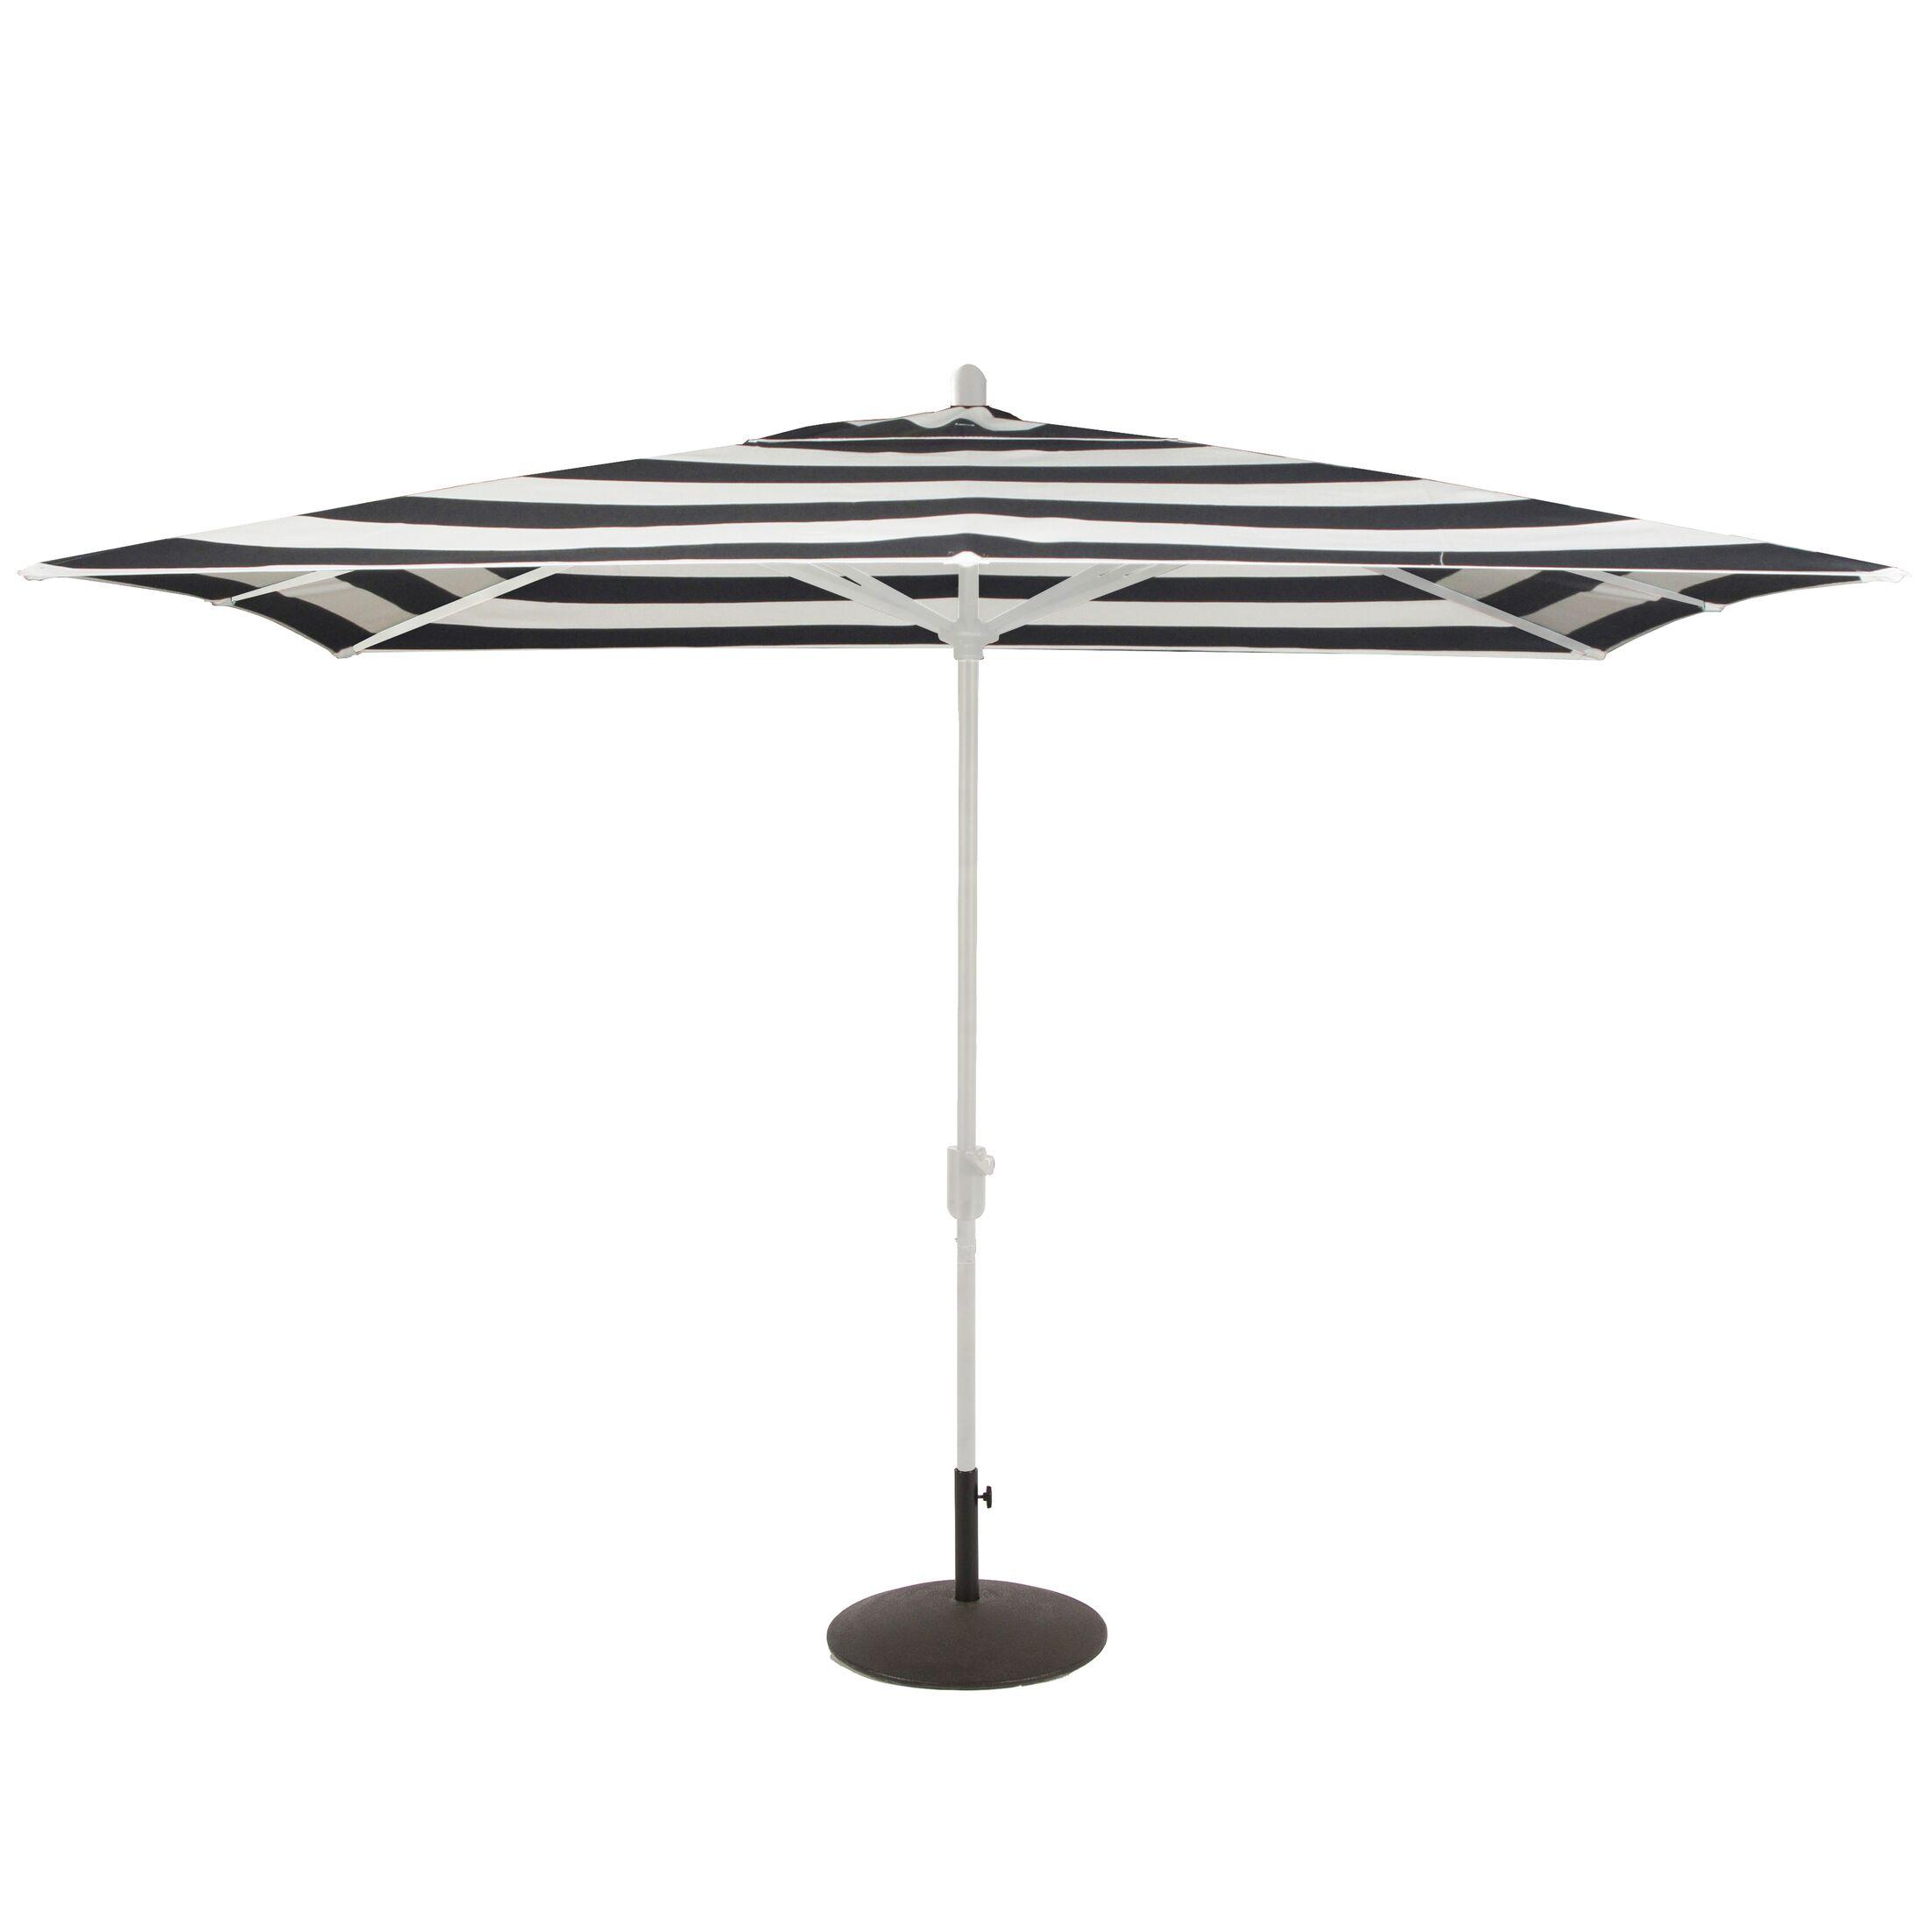 Centers Elastic 10' x 6.5' Rectangular Market Umbrella Frame Color: White Sand